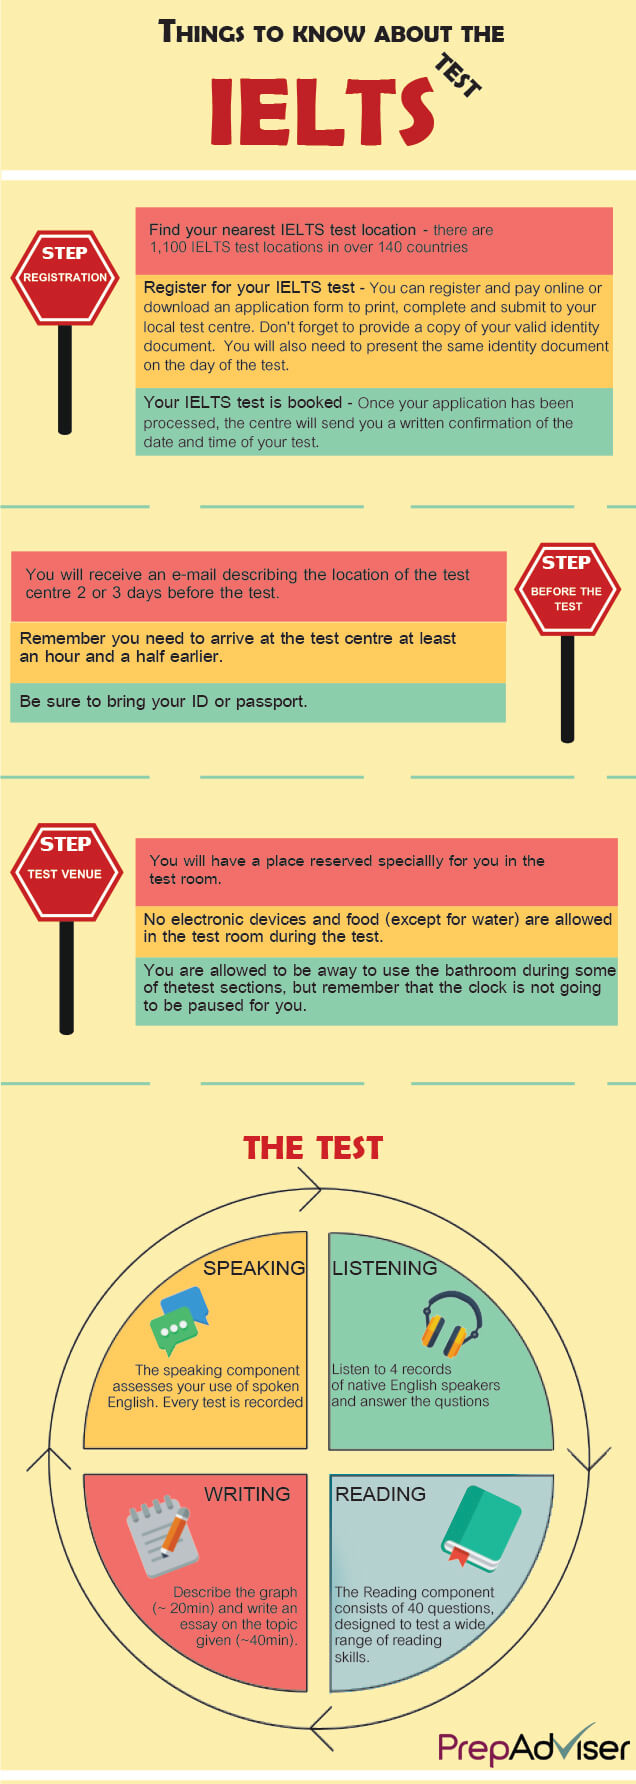 The IELTS test